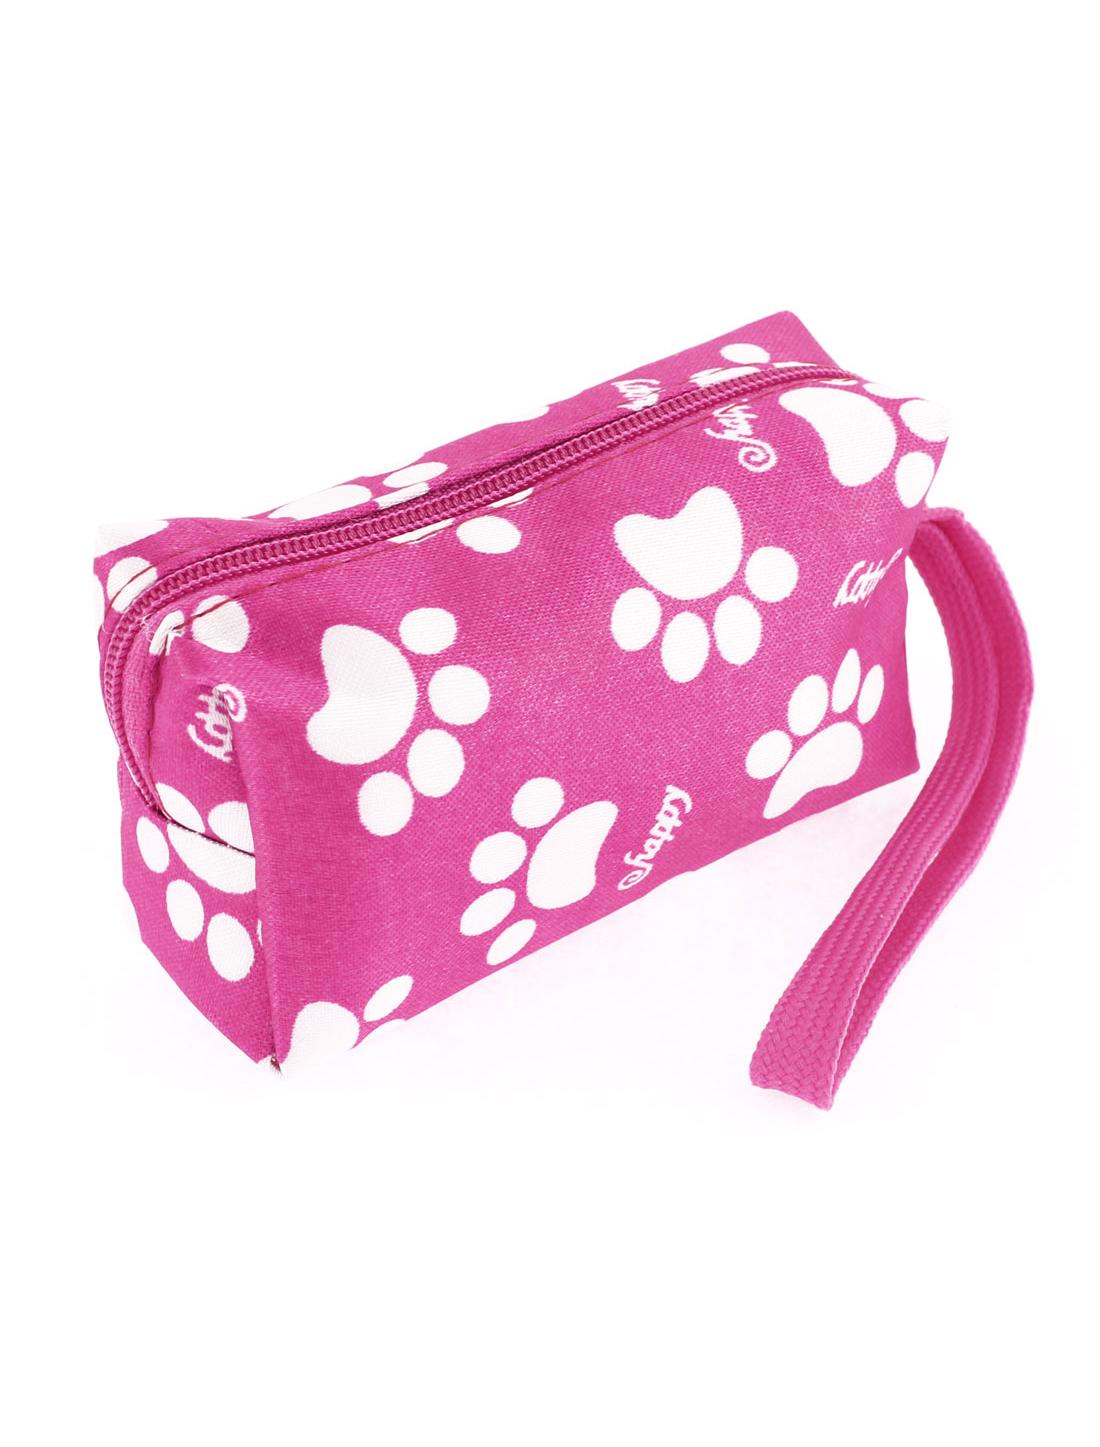 Ladies Zipper Closure White Footprints Pattern Cash Coin Key Credit Card Pink Purse Wallet